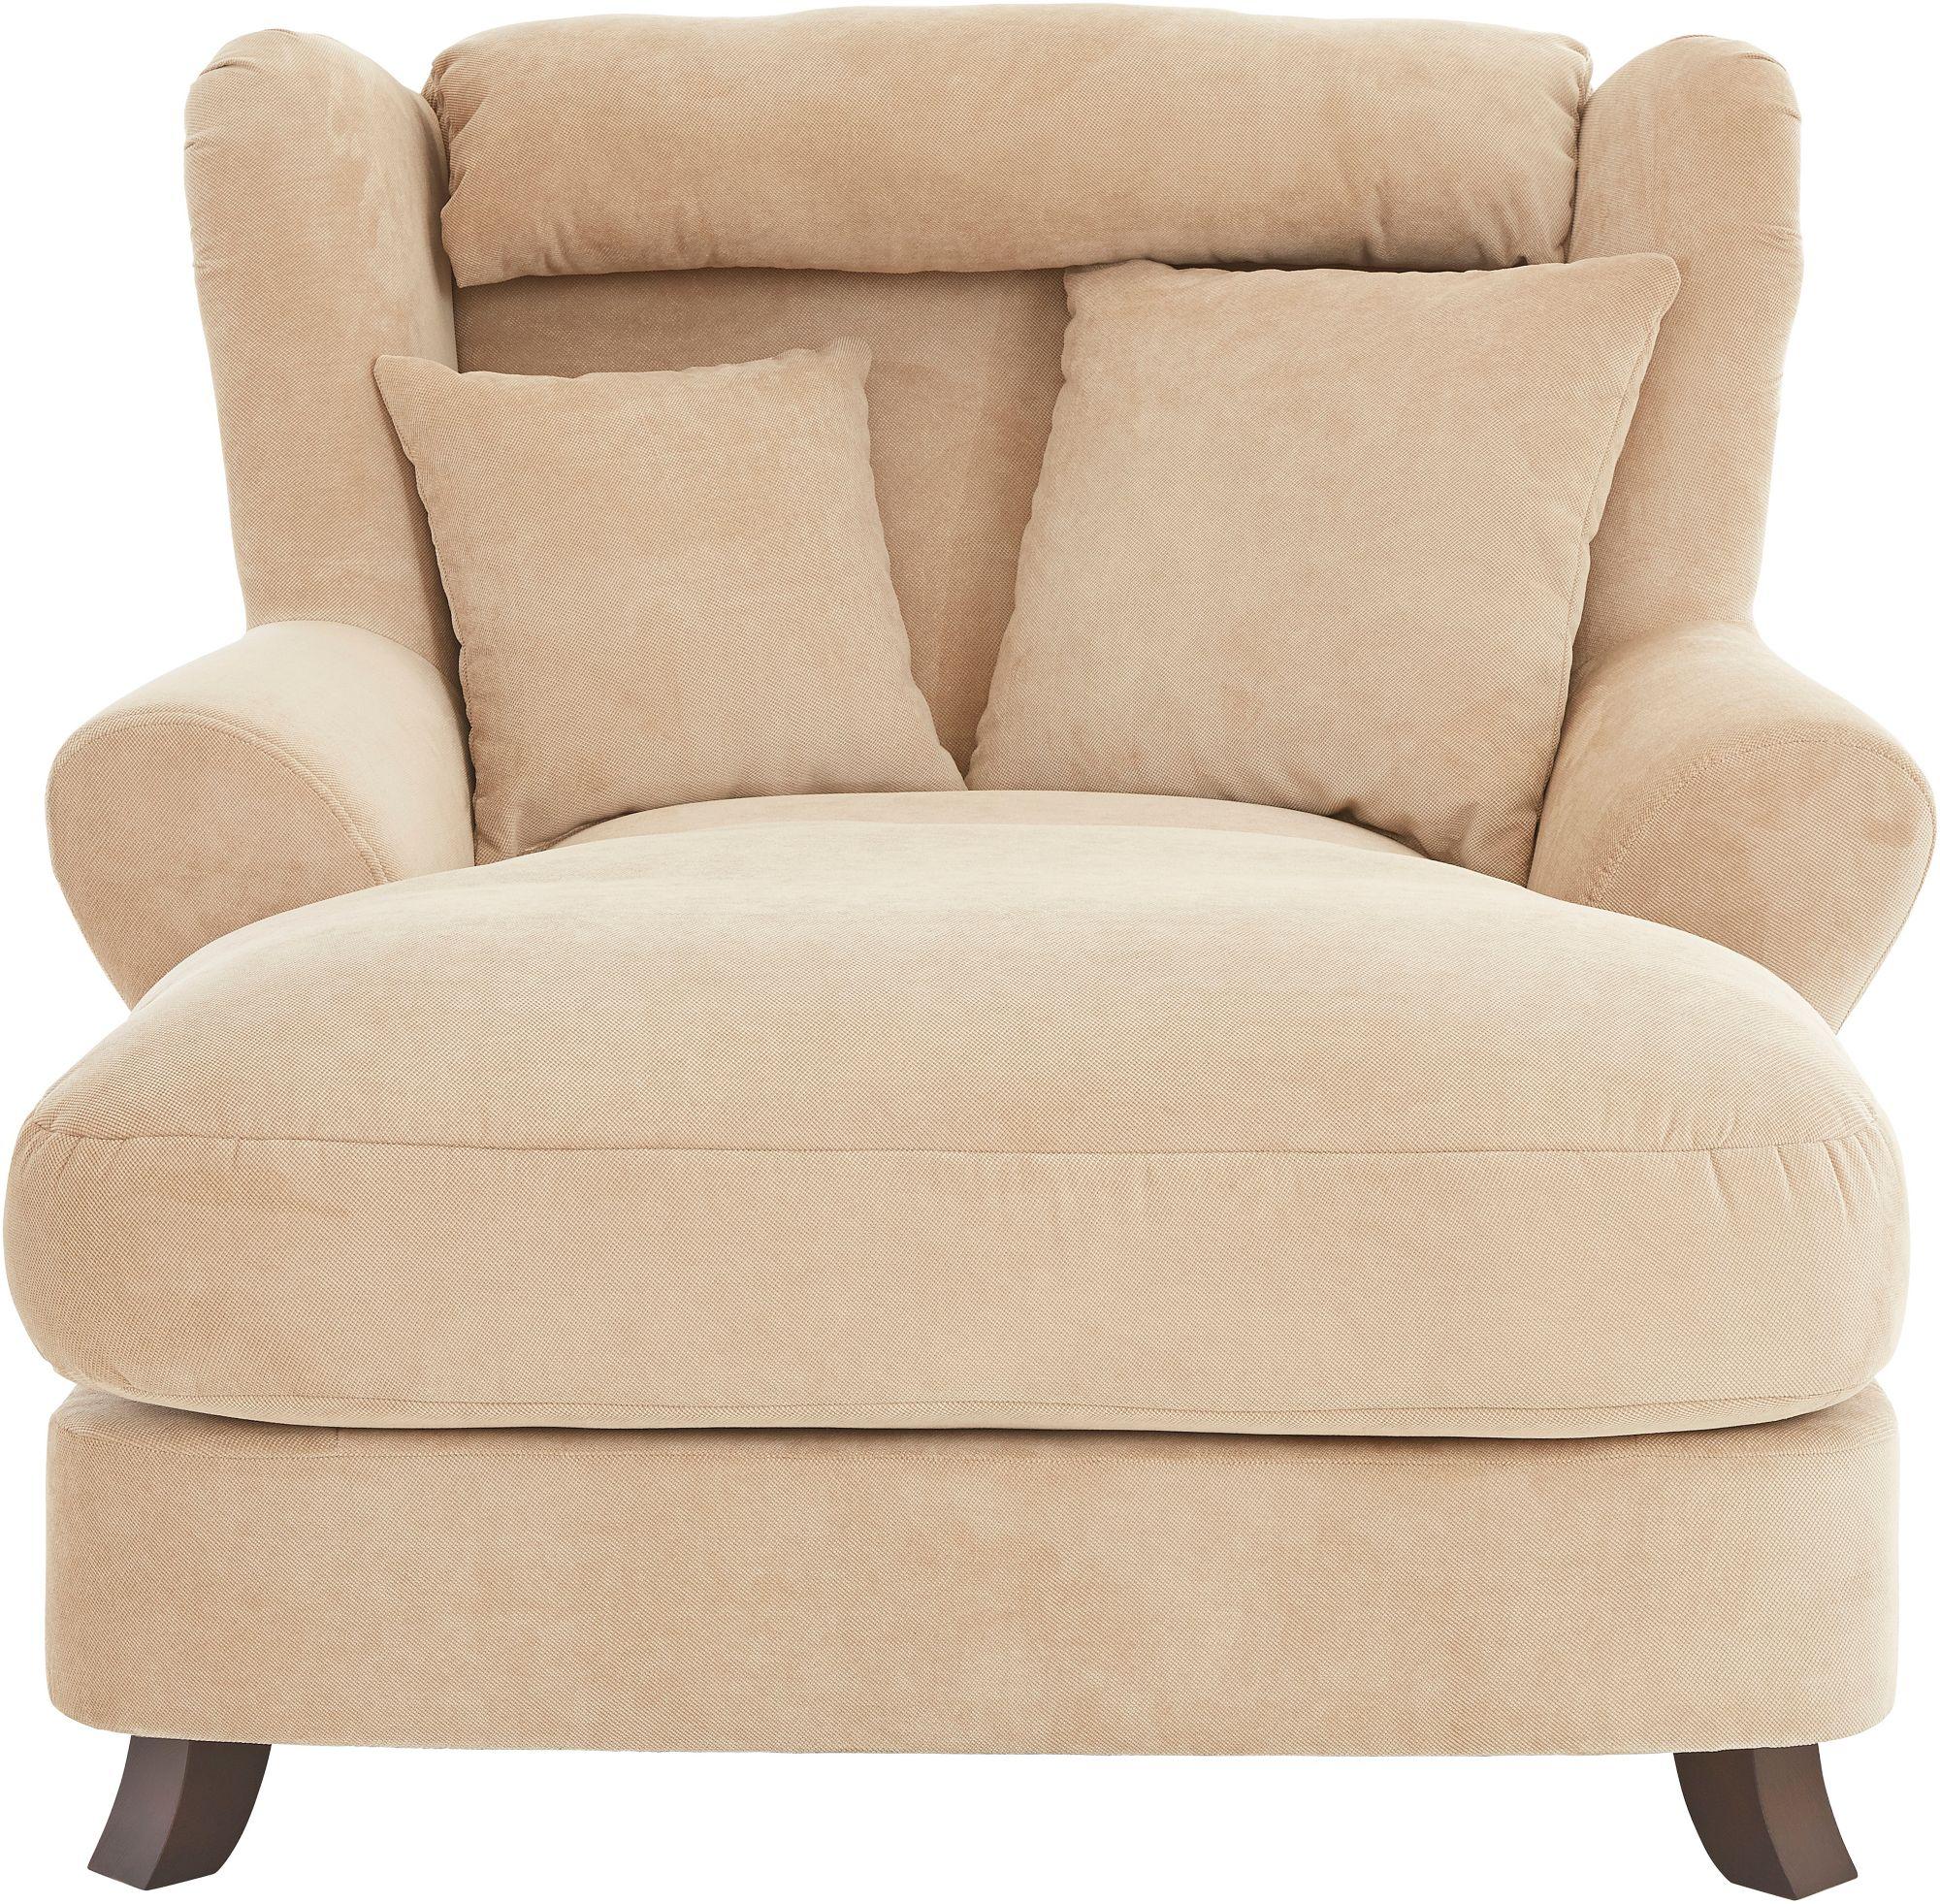 inosign mega sessel f r 2 personen schwab versand einzelsessel. Black Bedroom Furniture Sets. Home Design Ideas